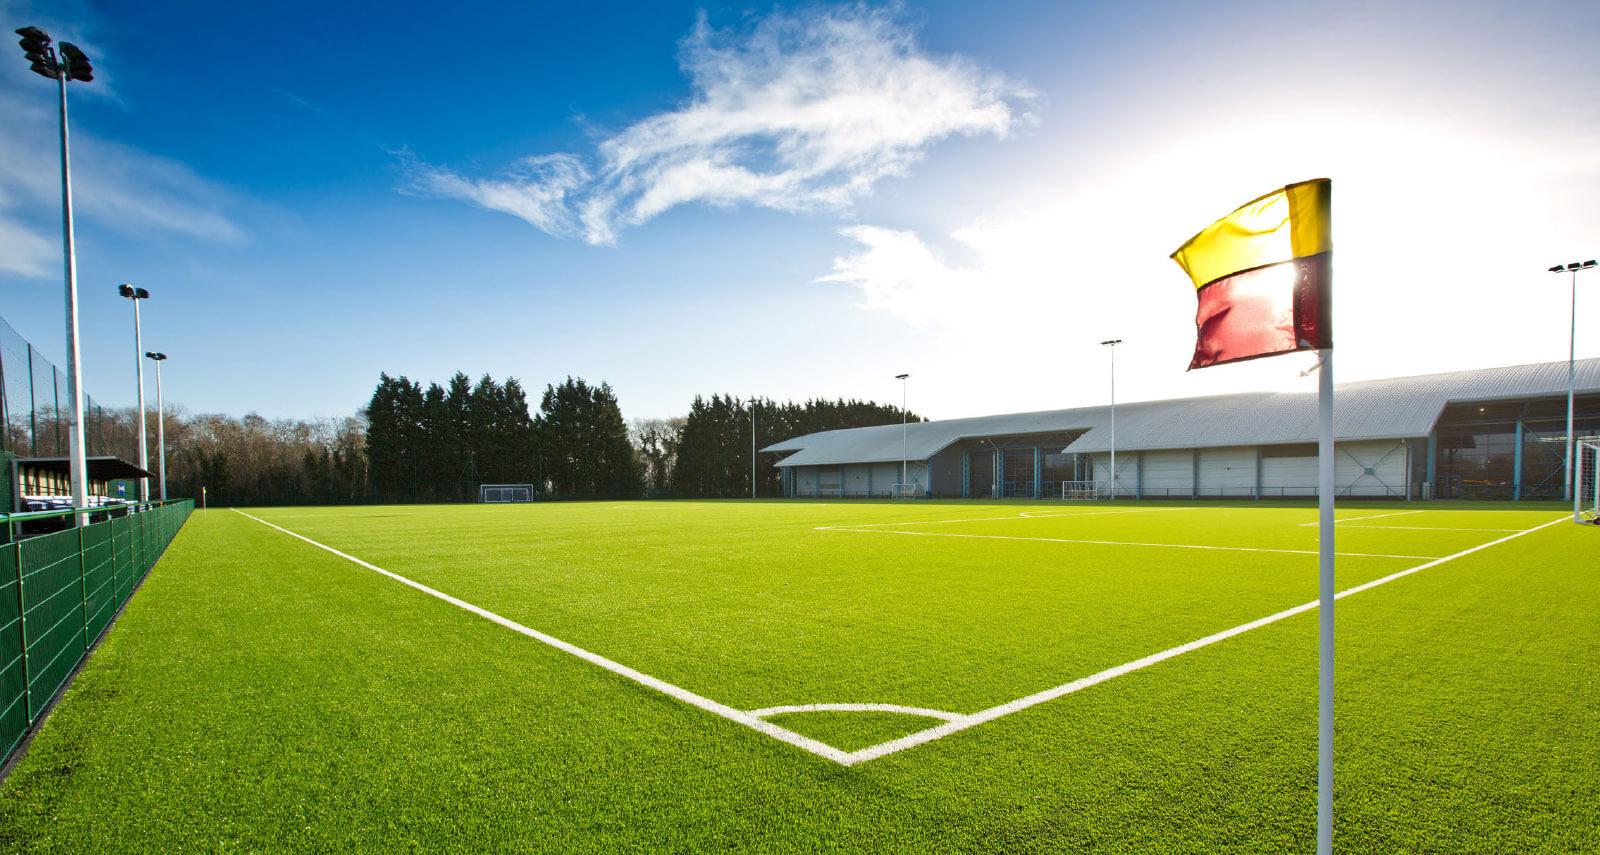 3G sports pitch